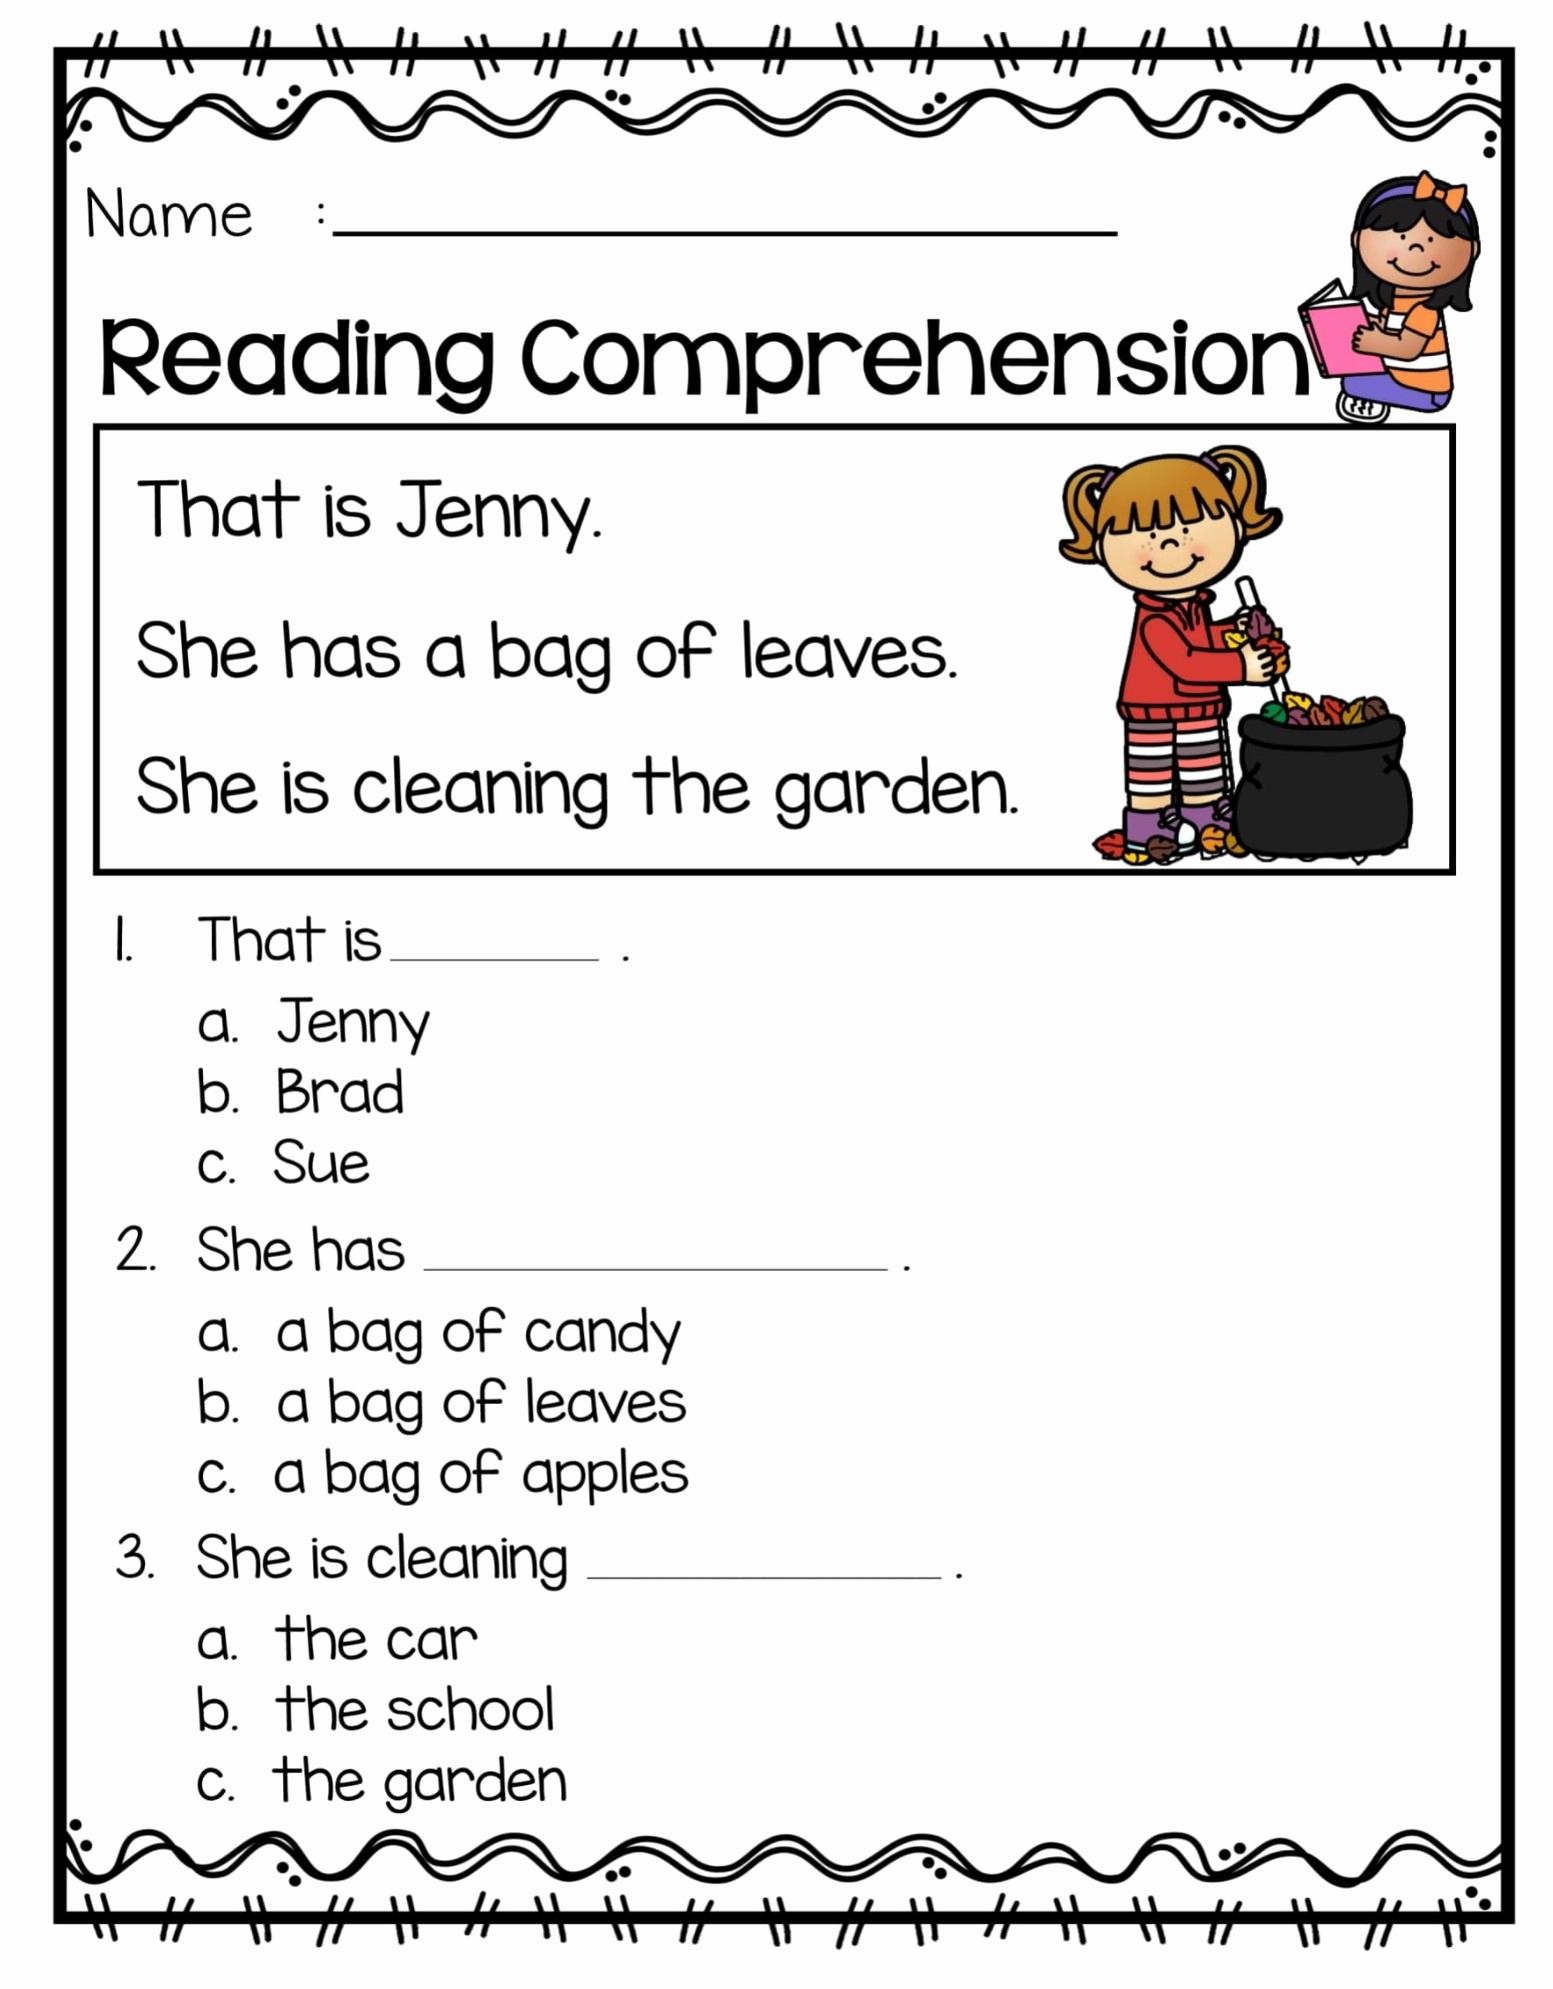 Printable First Grade Reading Worksheets Inspirational 1st Grade Reading Prehension Worksheets Printable Pdf